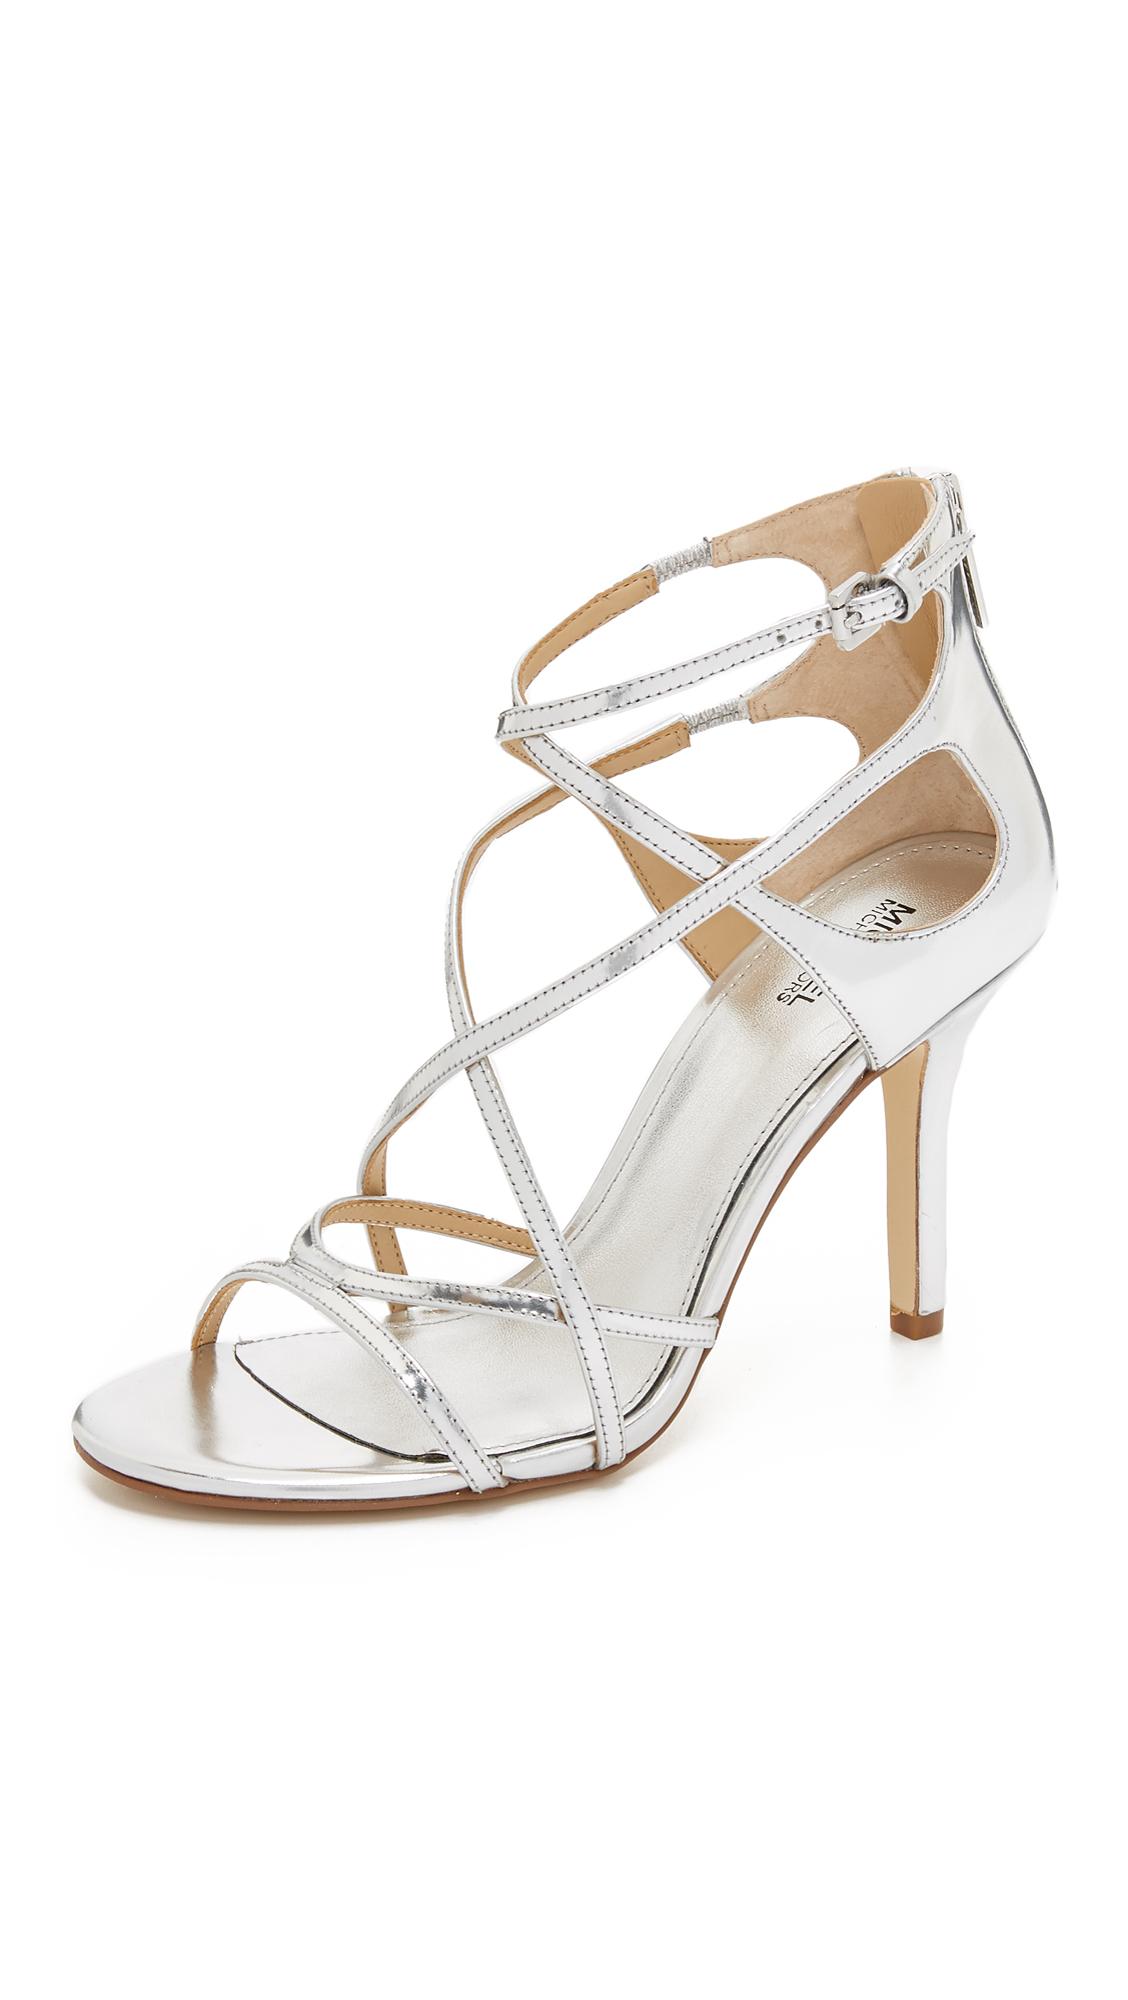 3dacc313a Lyst - Michael Michael Kors Linette Sandals in Metallic